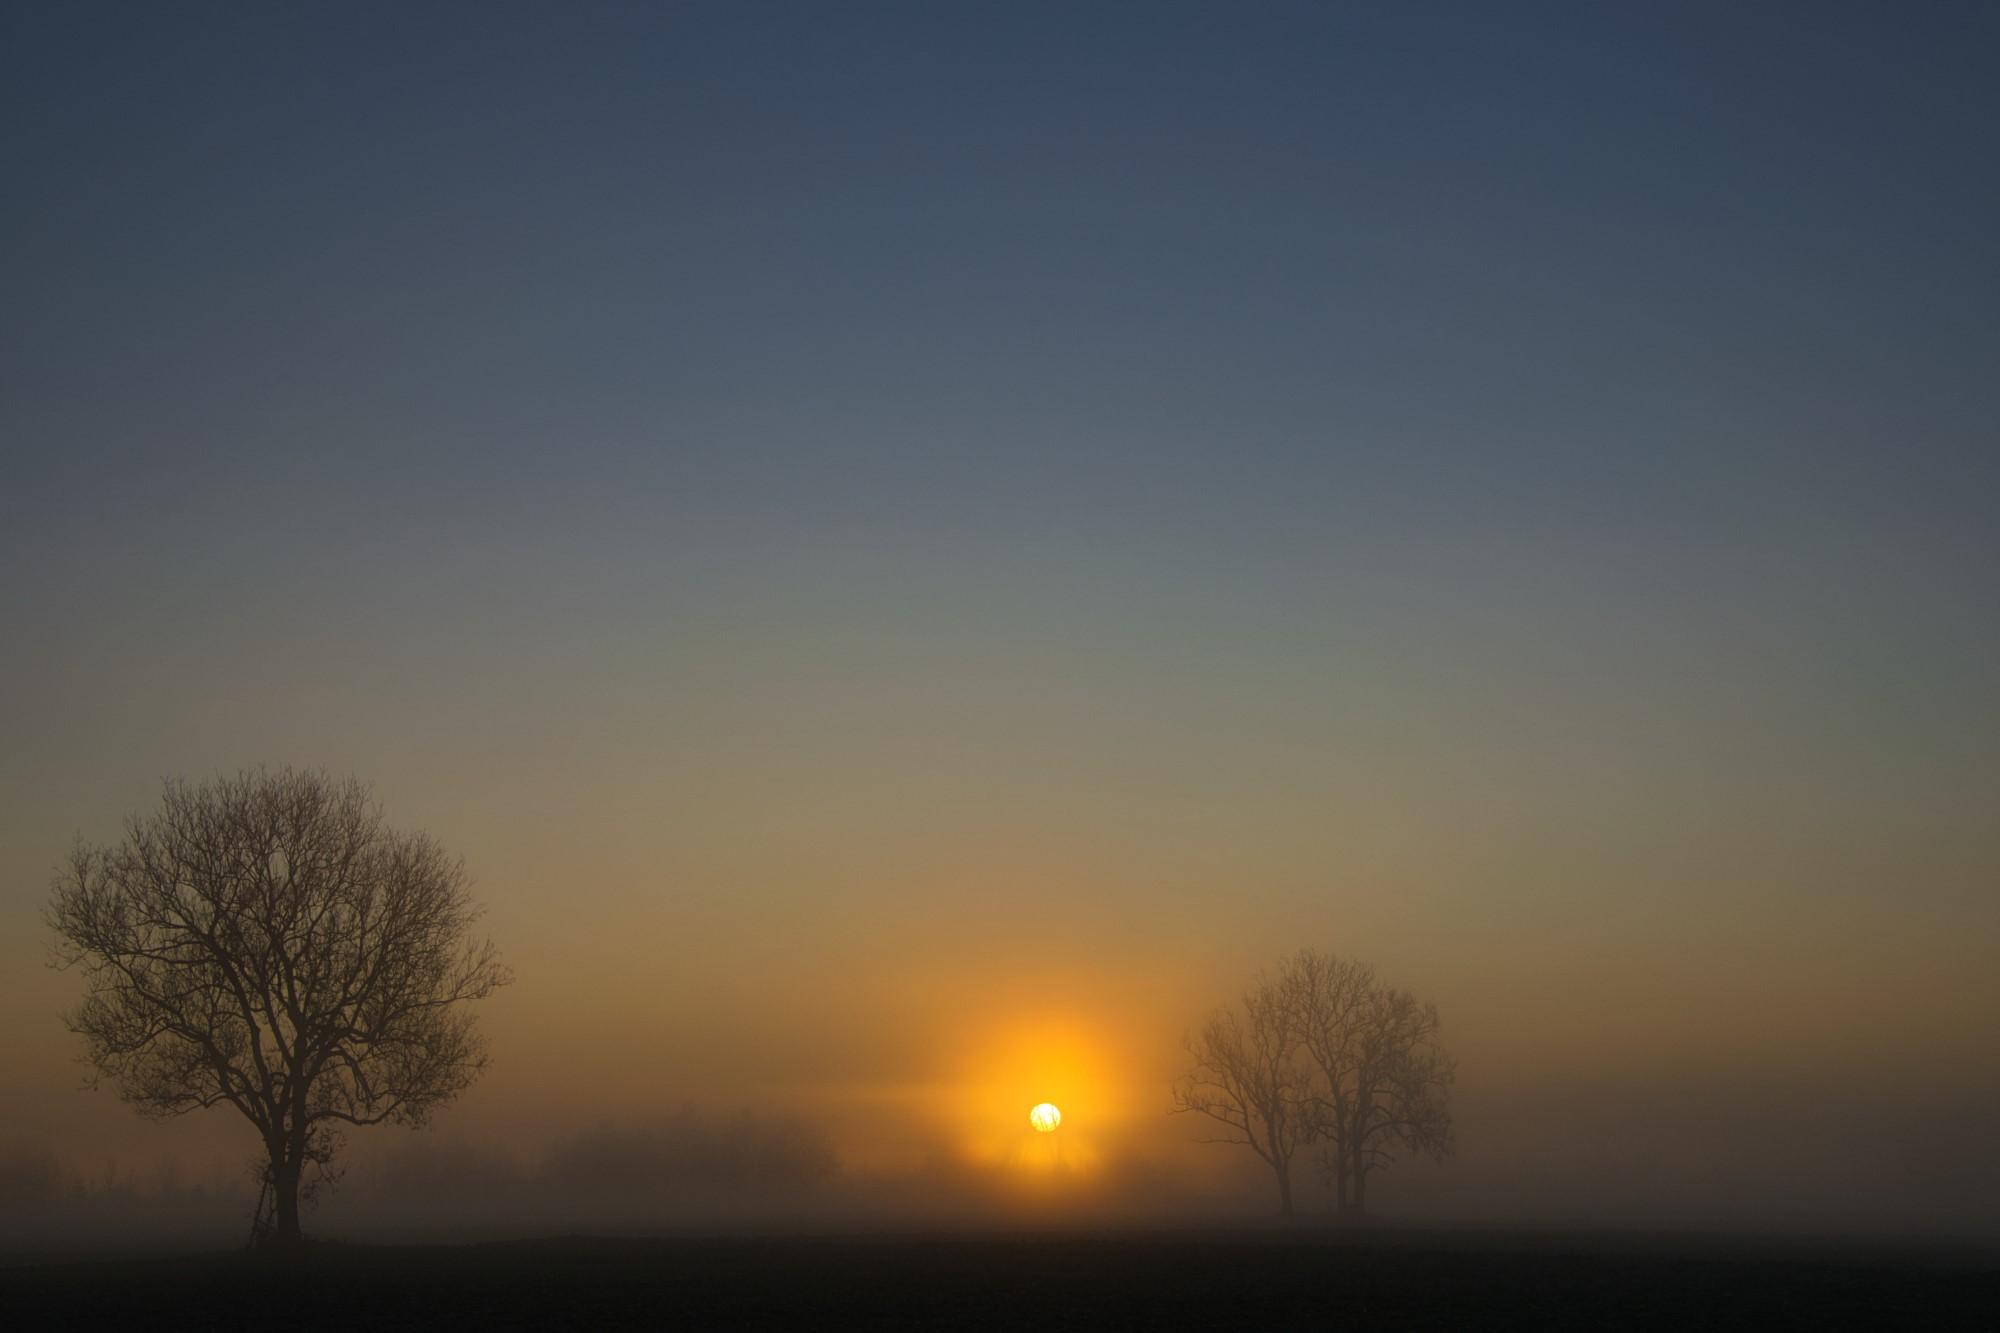 Sonnenaufgang-3